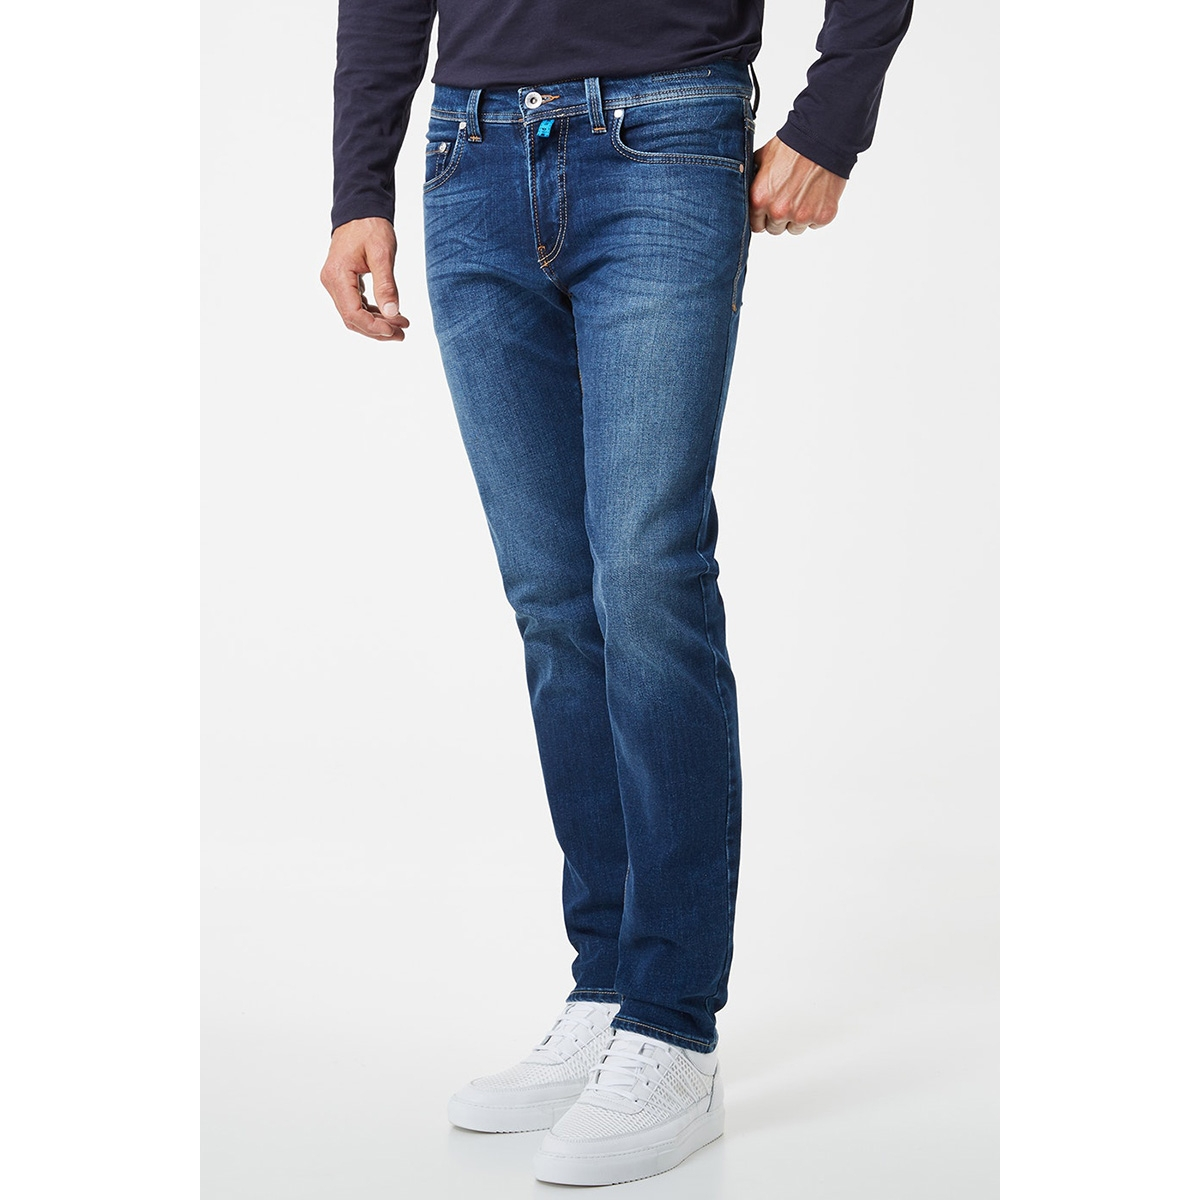 future flex 3451 pierre cardin jeans. Black Bedroom Furniture Sets. Home Design Ideas